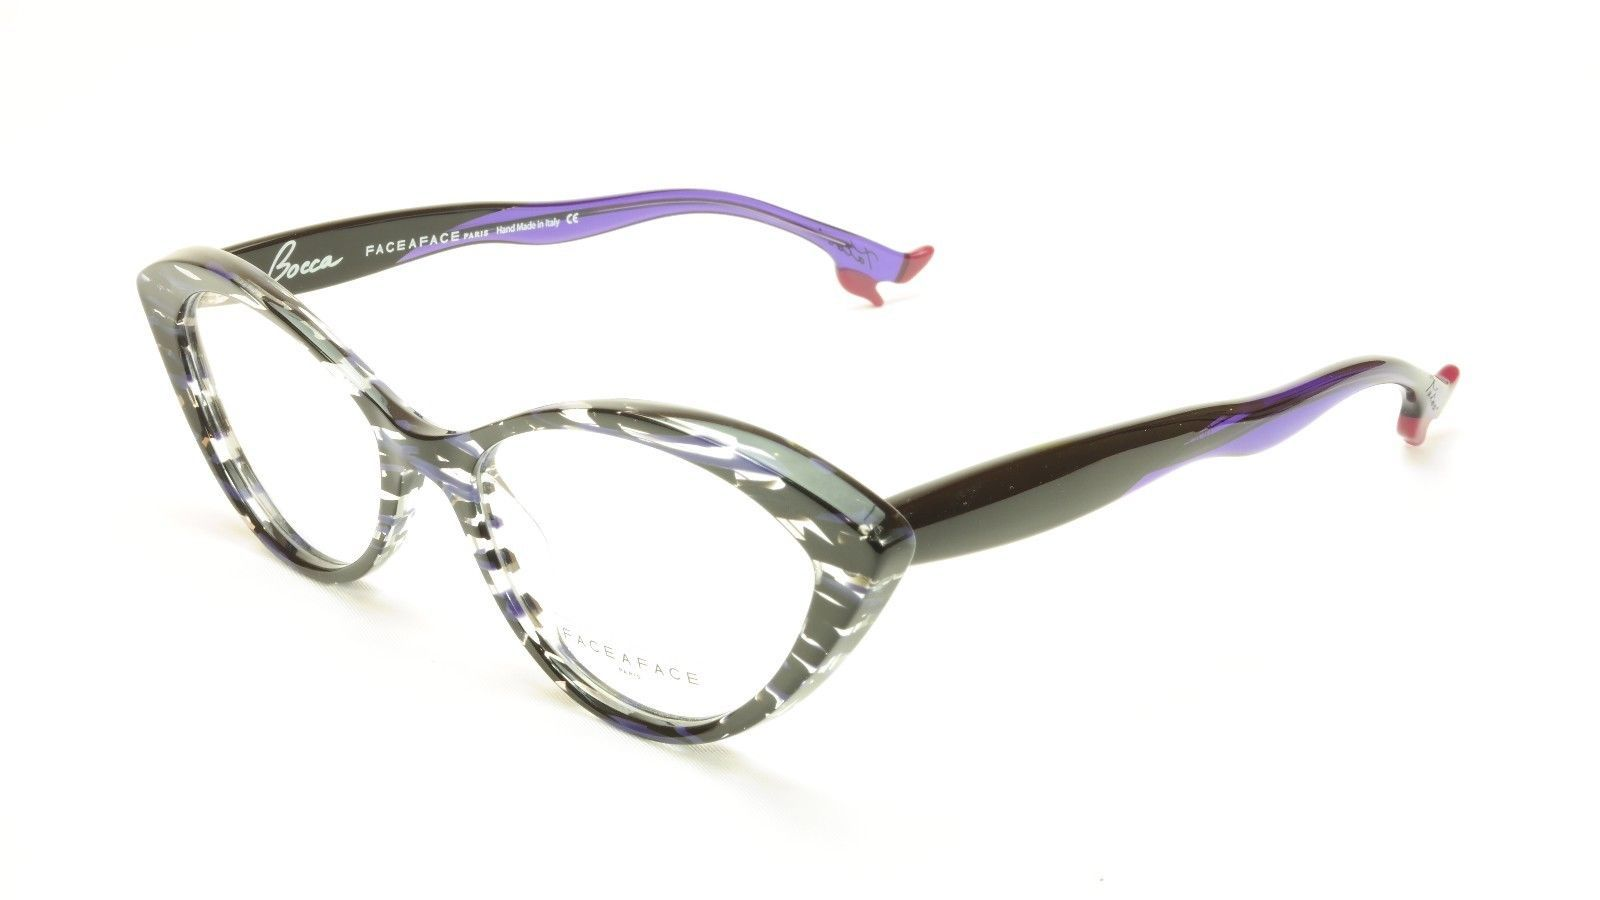 dd27ae7e251 Face A Face Bocca Tatoo 1 Col. 2014 Lines and Blue Light Eyeglasses Italy  Made